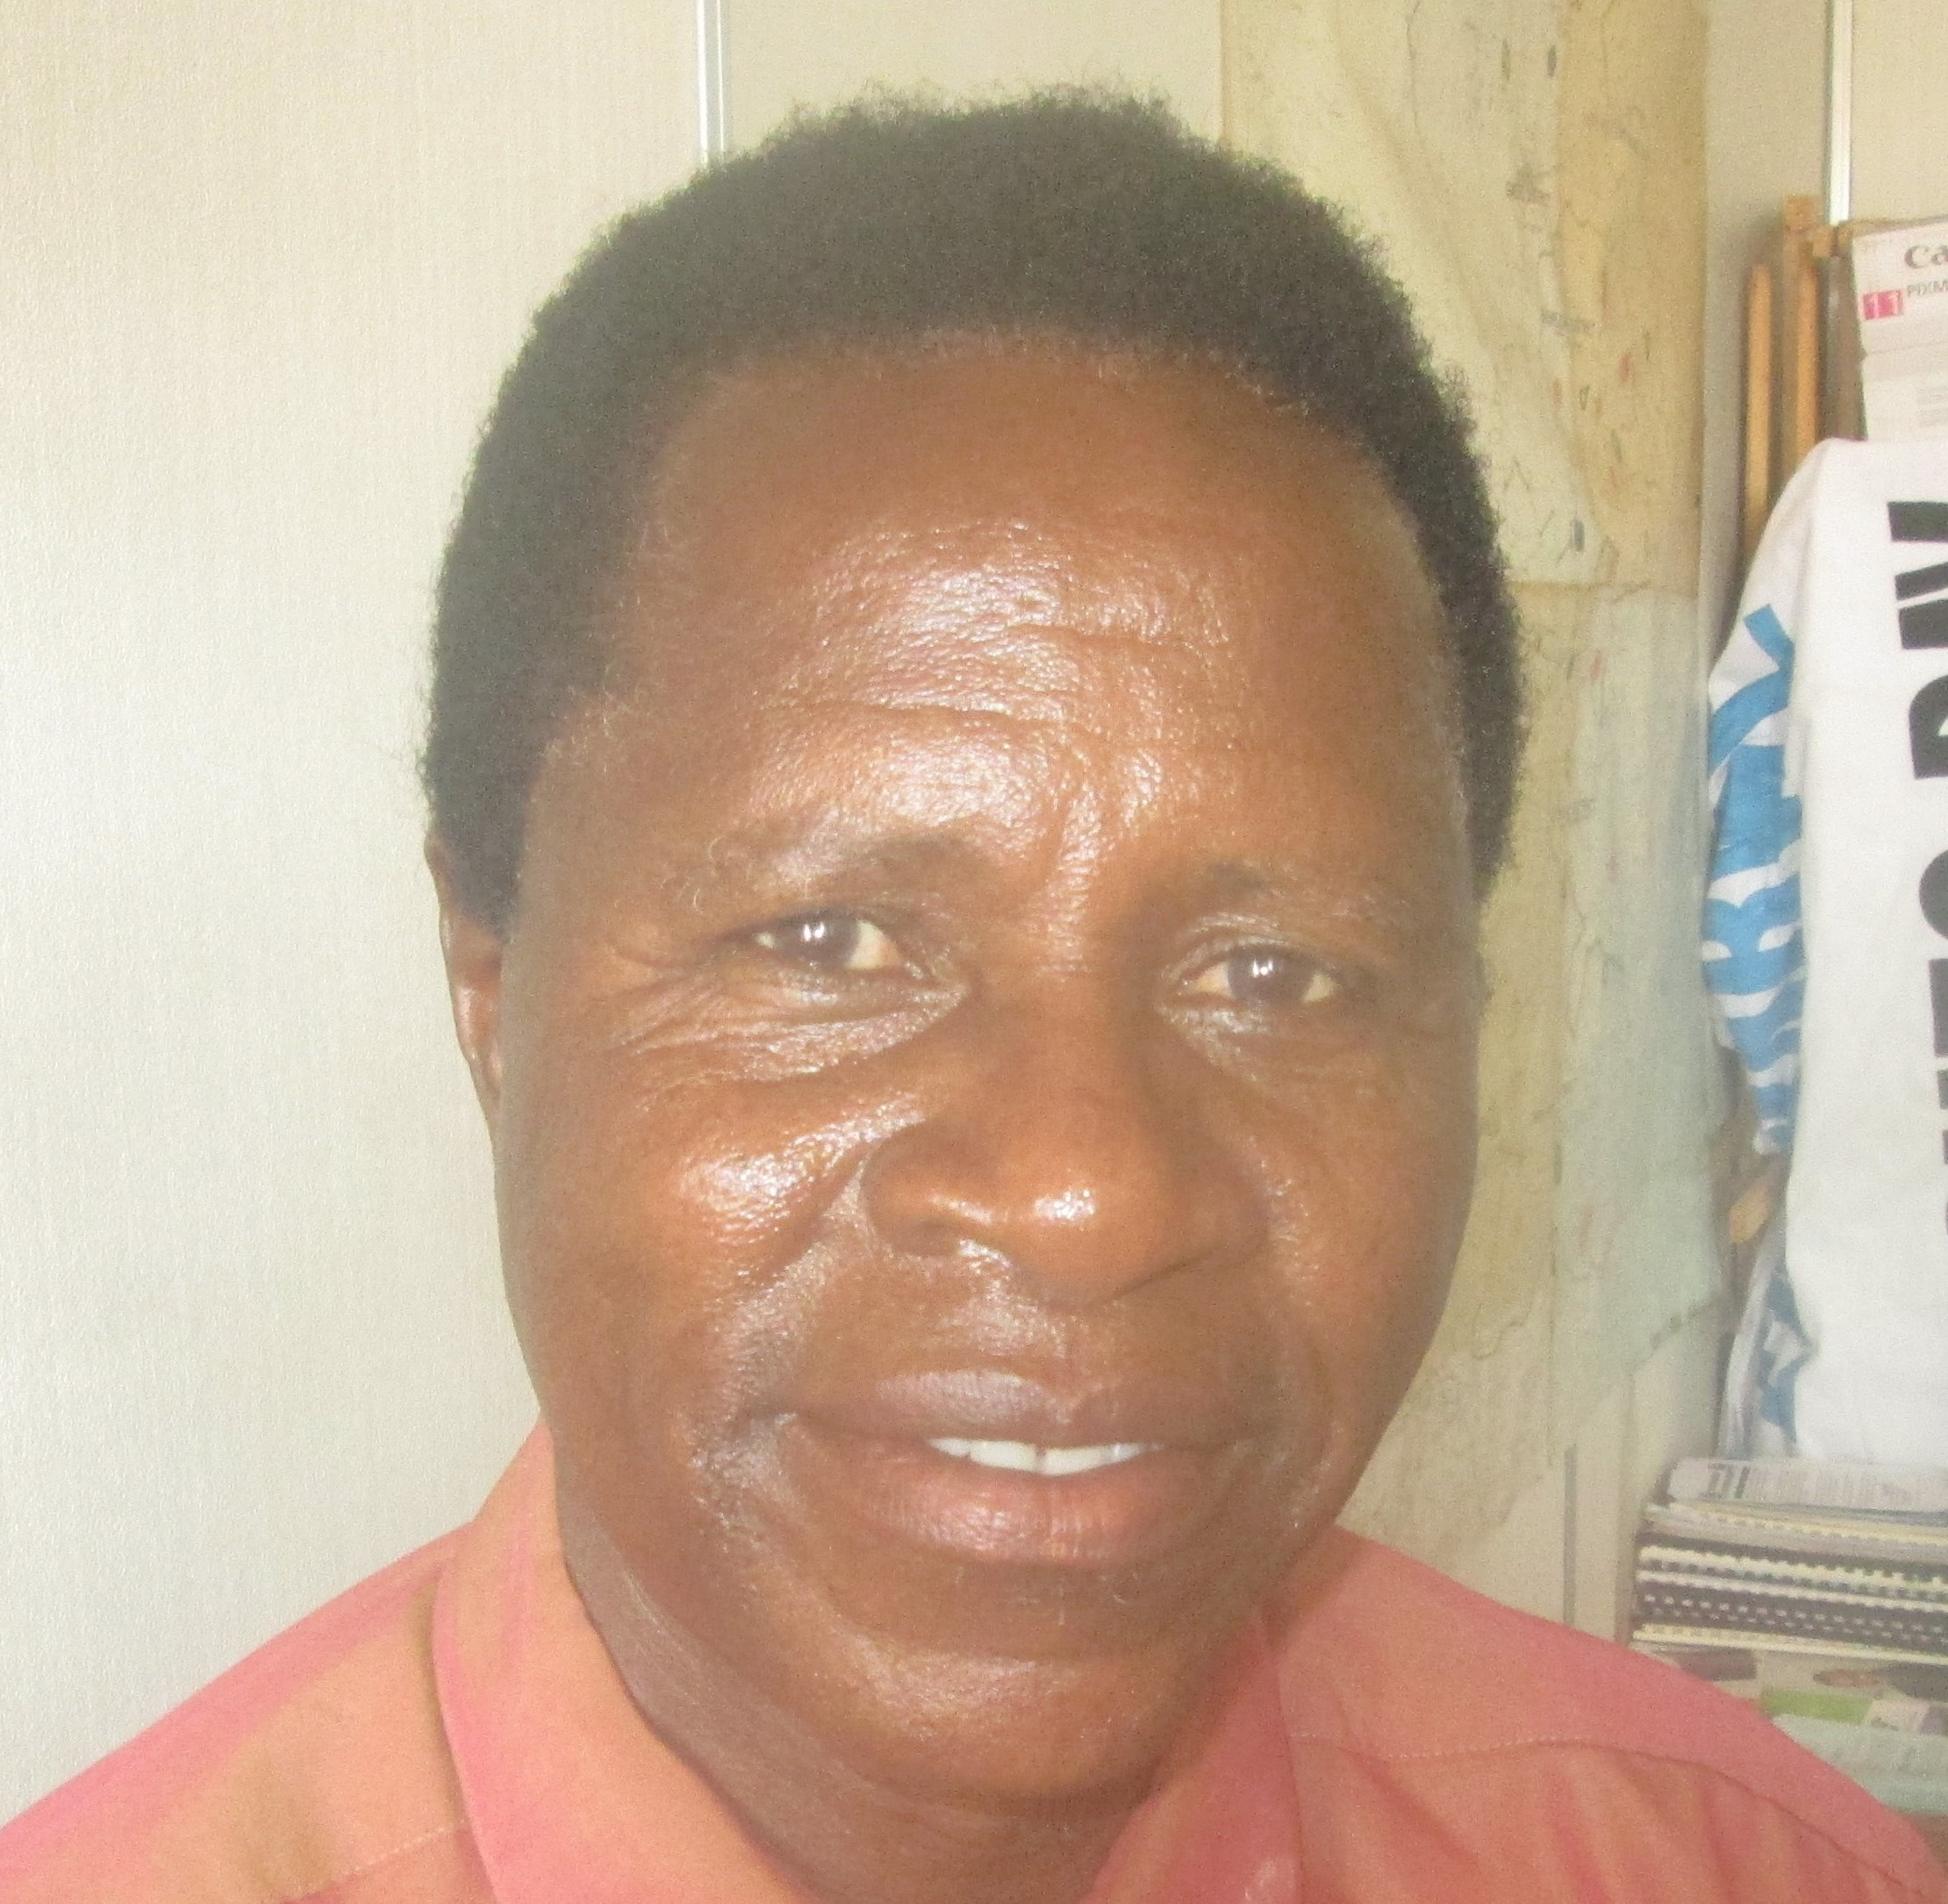 Mr Manyongo